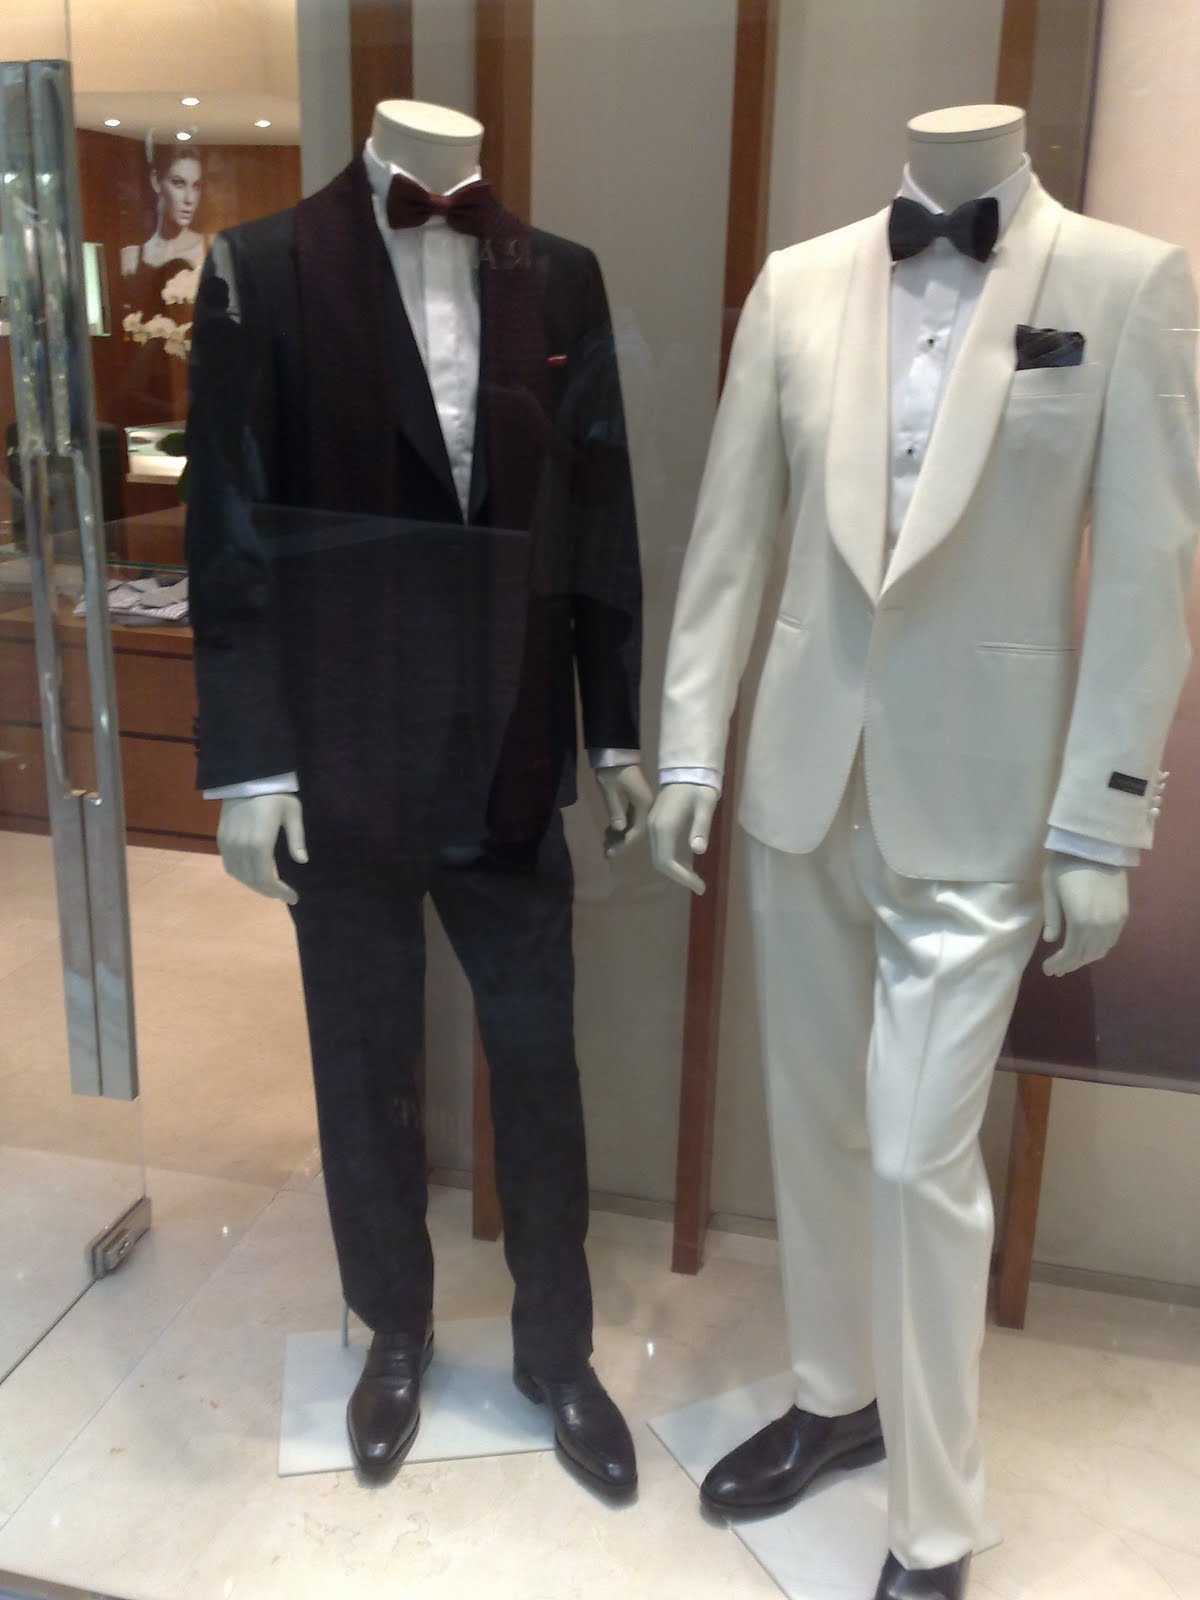 Fantastic Wedding Suits for Men for Hire Concept - Bruman MMC